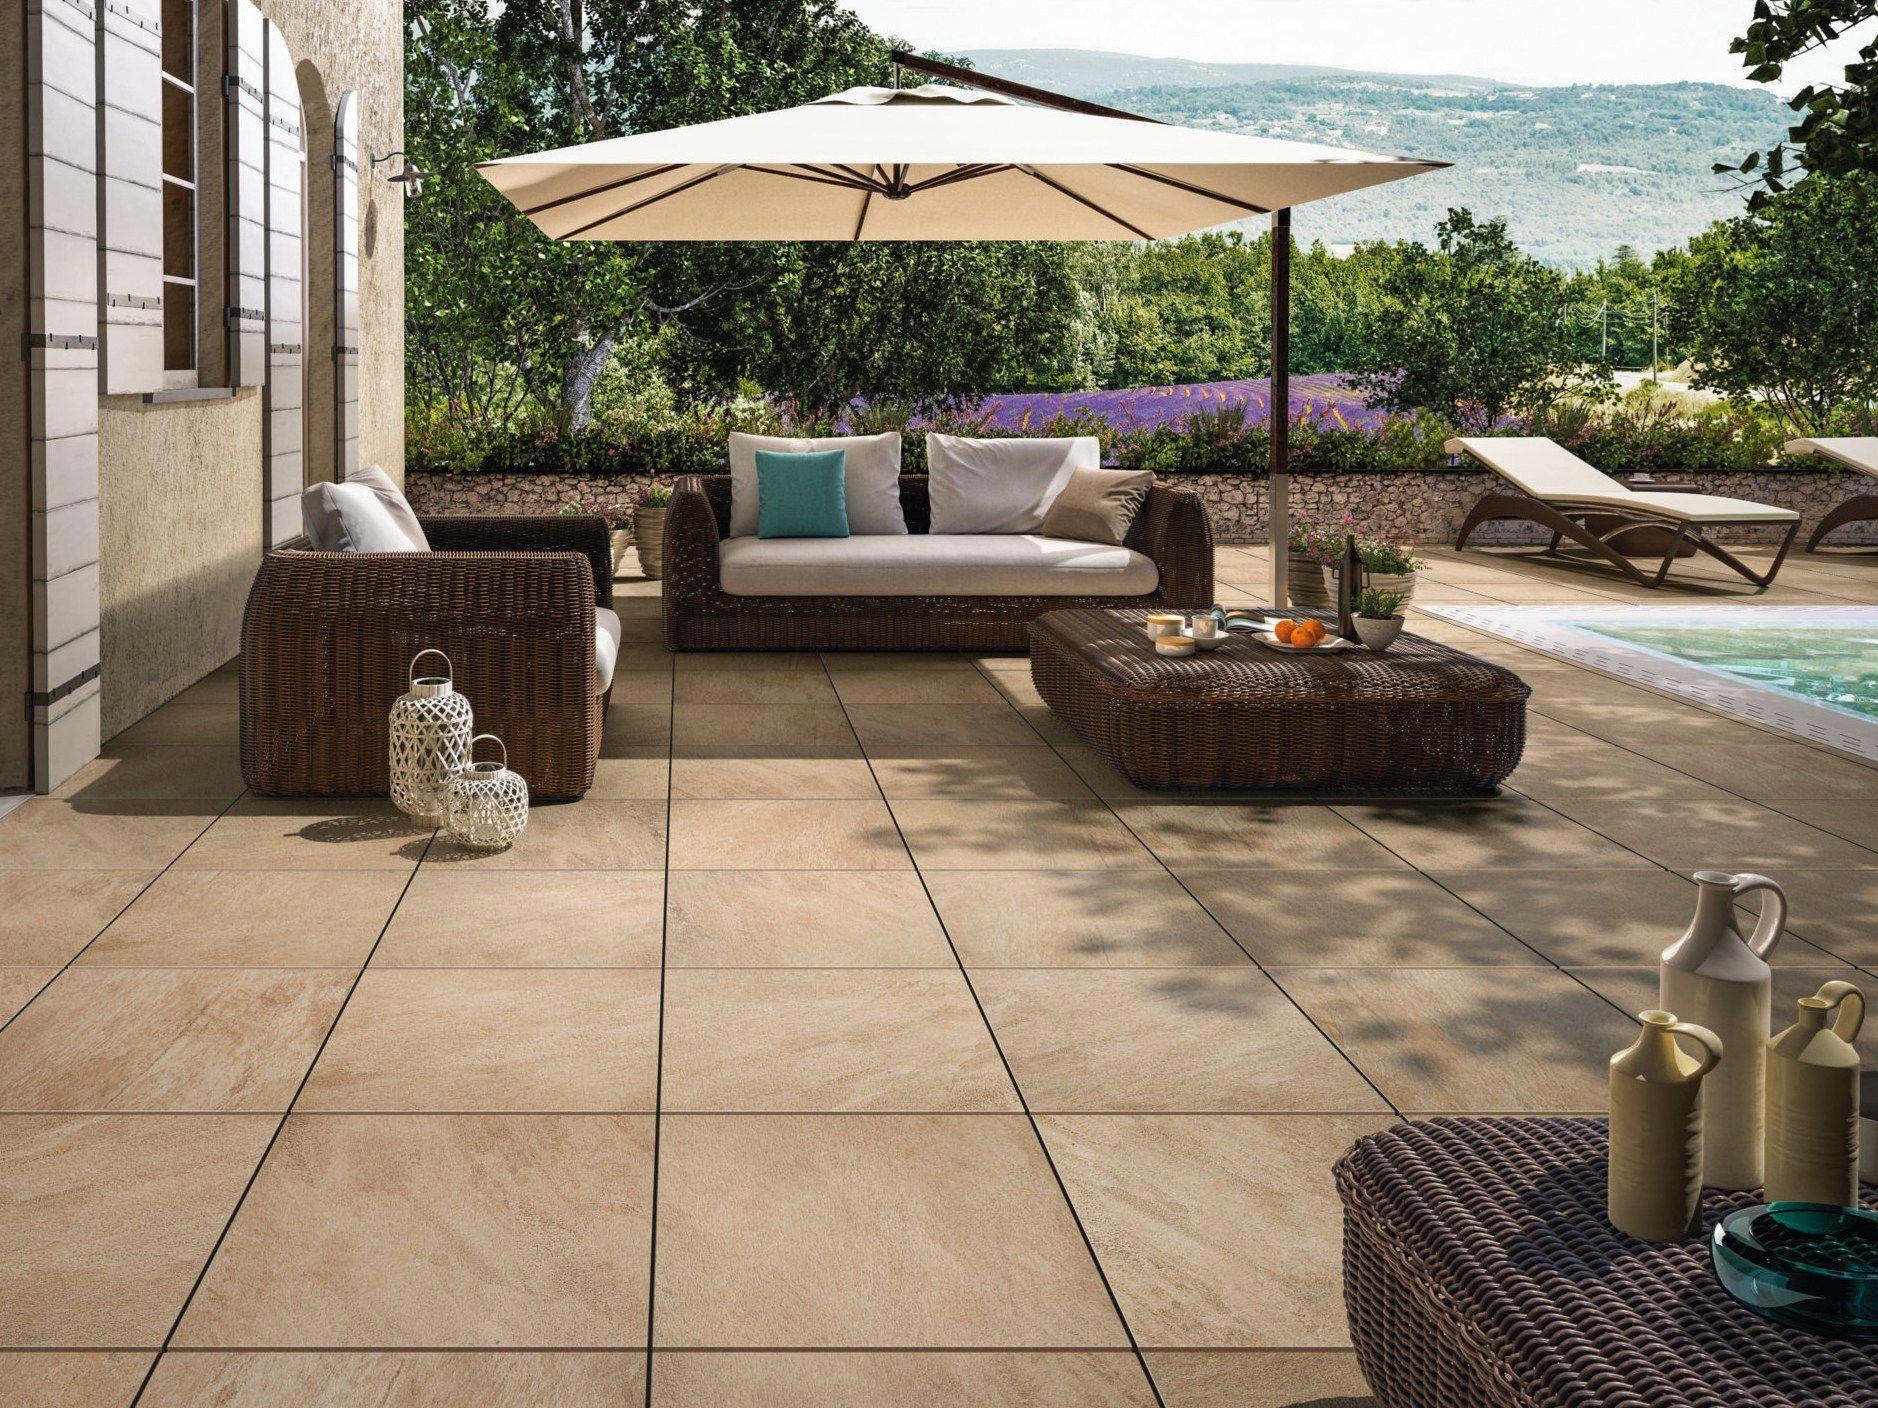 pavimento per esterni in gres porcellanato effetto pietra my earth outdoor by villeroy boch. Black Bedroom Furniture Sets. Home Design Ideas